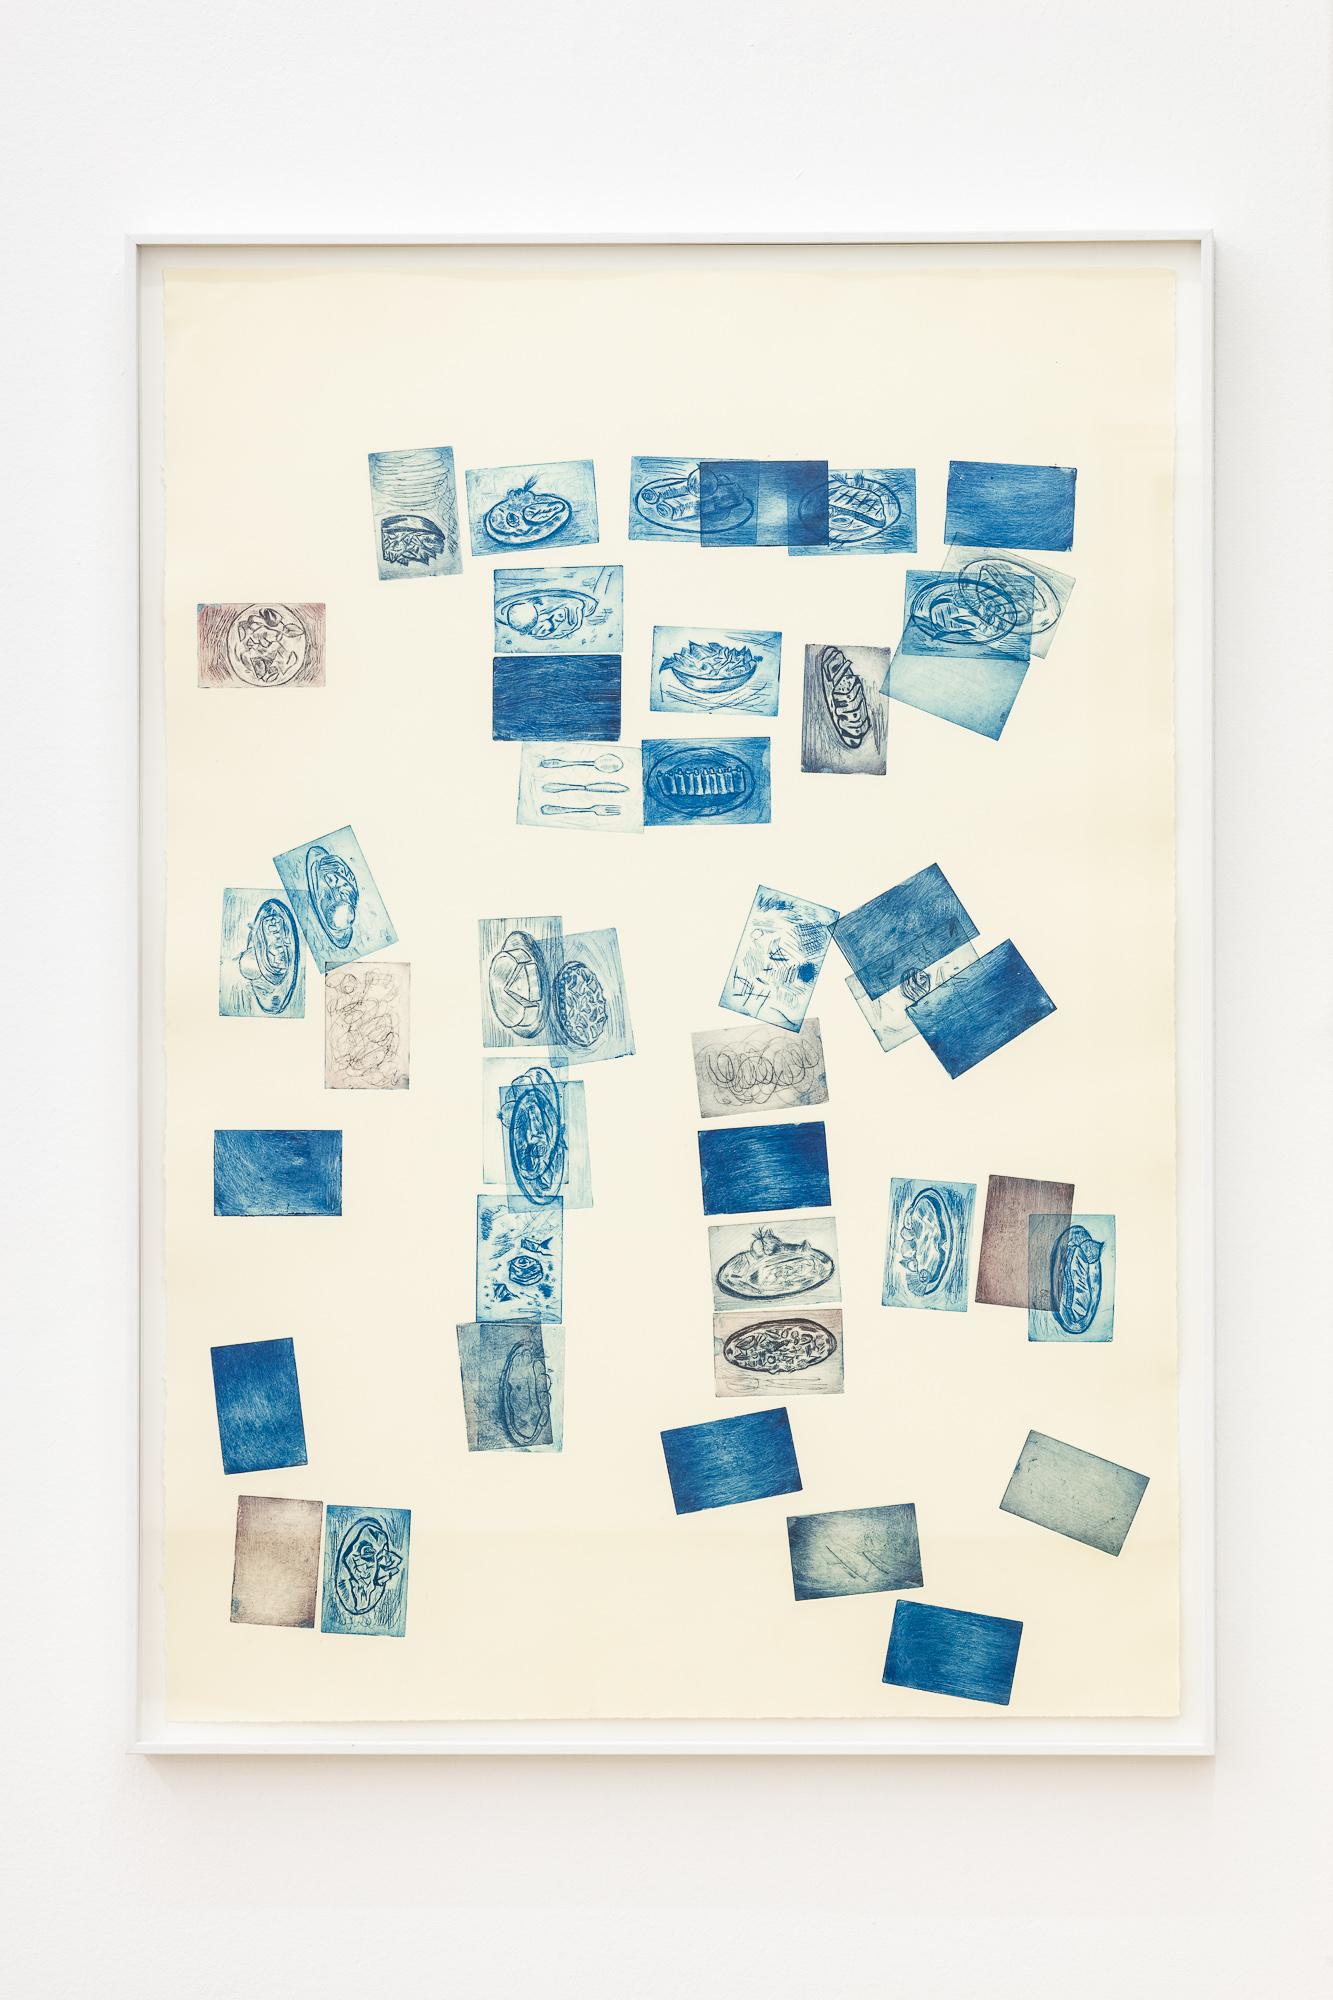 2019_01_25_Knut Ivar Aaser at Felix Gaudlitz_by kunst-dokumentationcom_Werkbilder_015_web.jpg